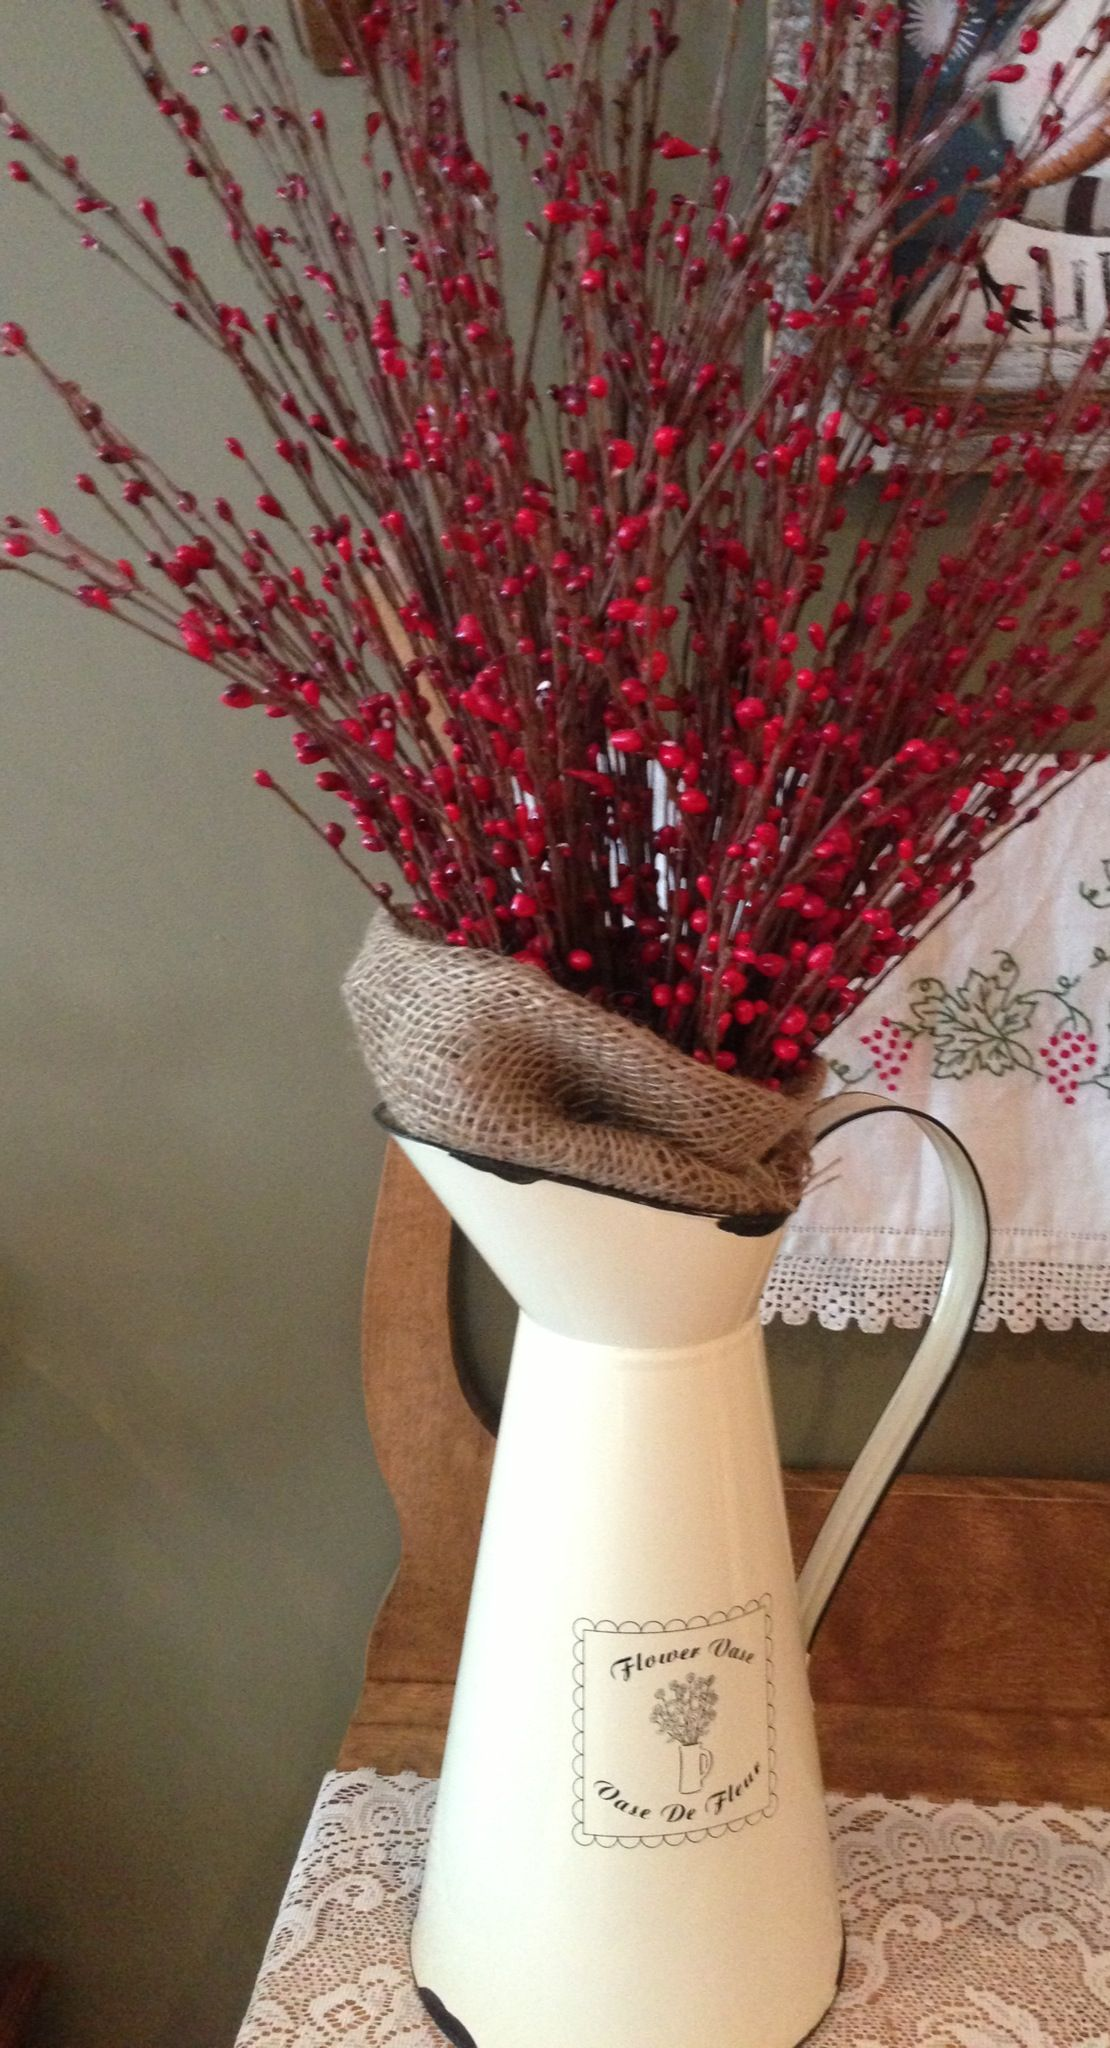 Primitive decor | For the Home | Pinterest